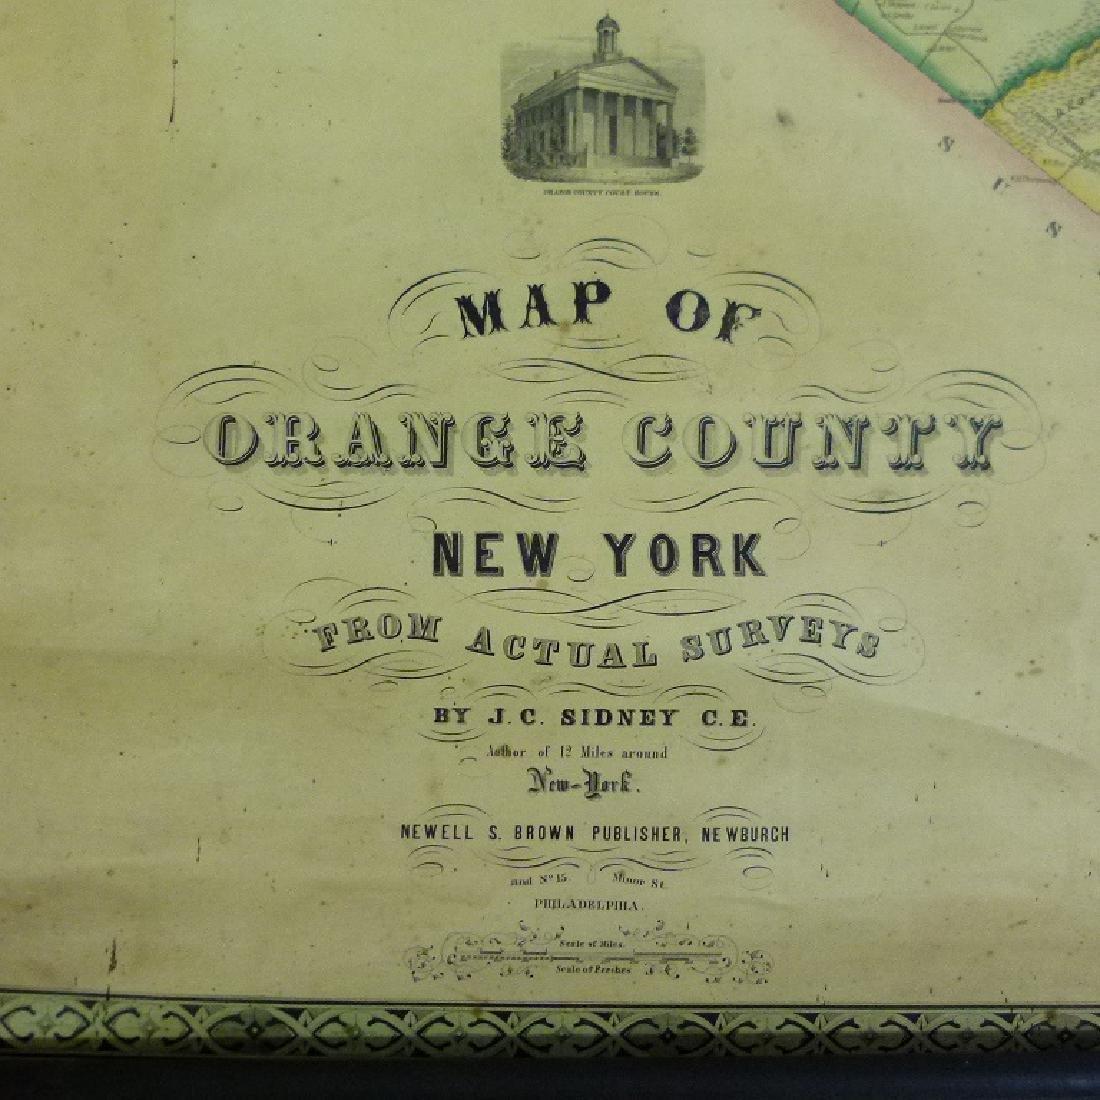 ORANGE COUNTY NEW YORK MAP, SIDNEY 1850